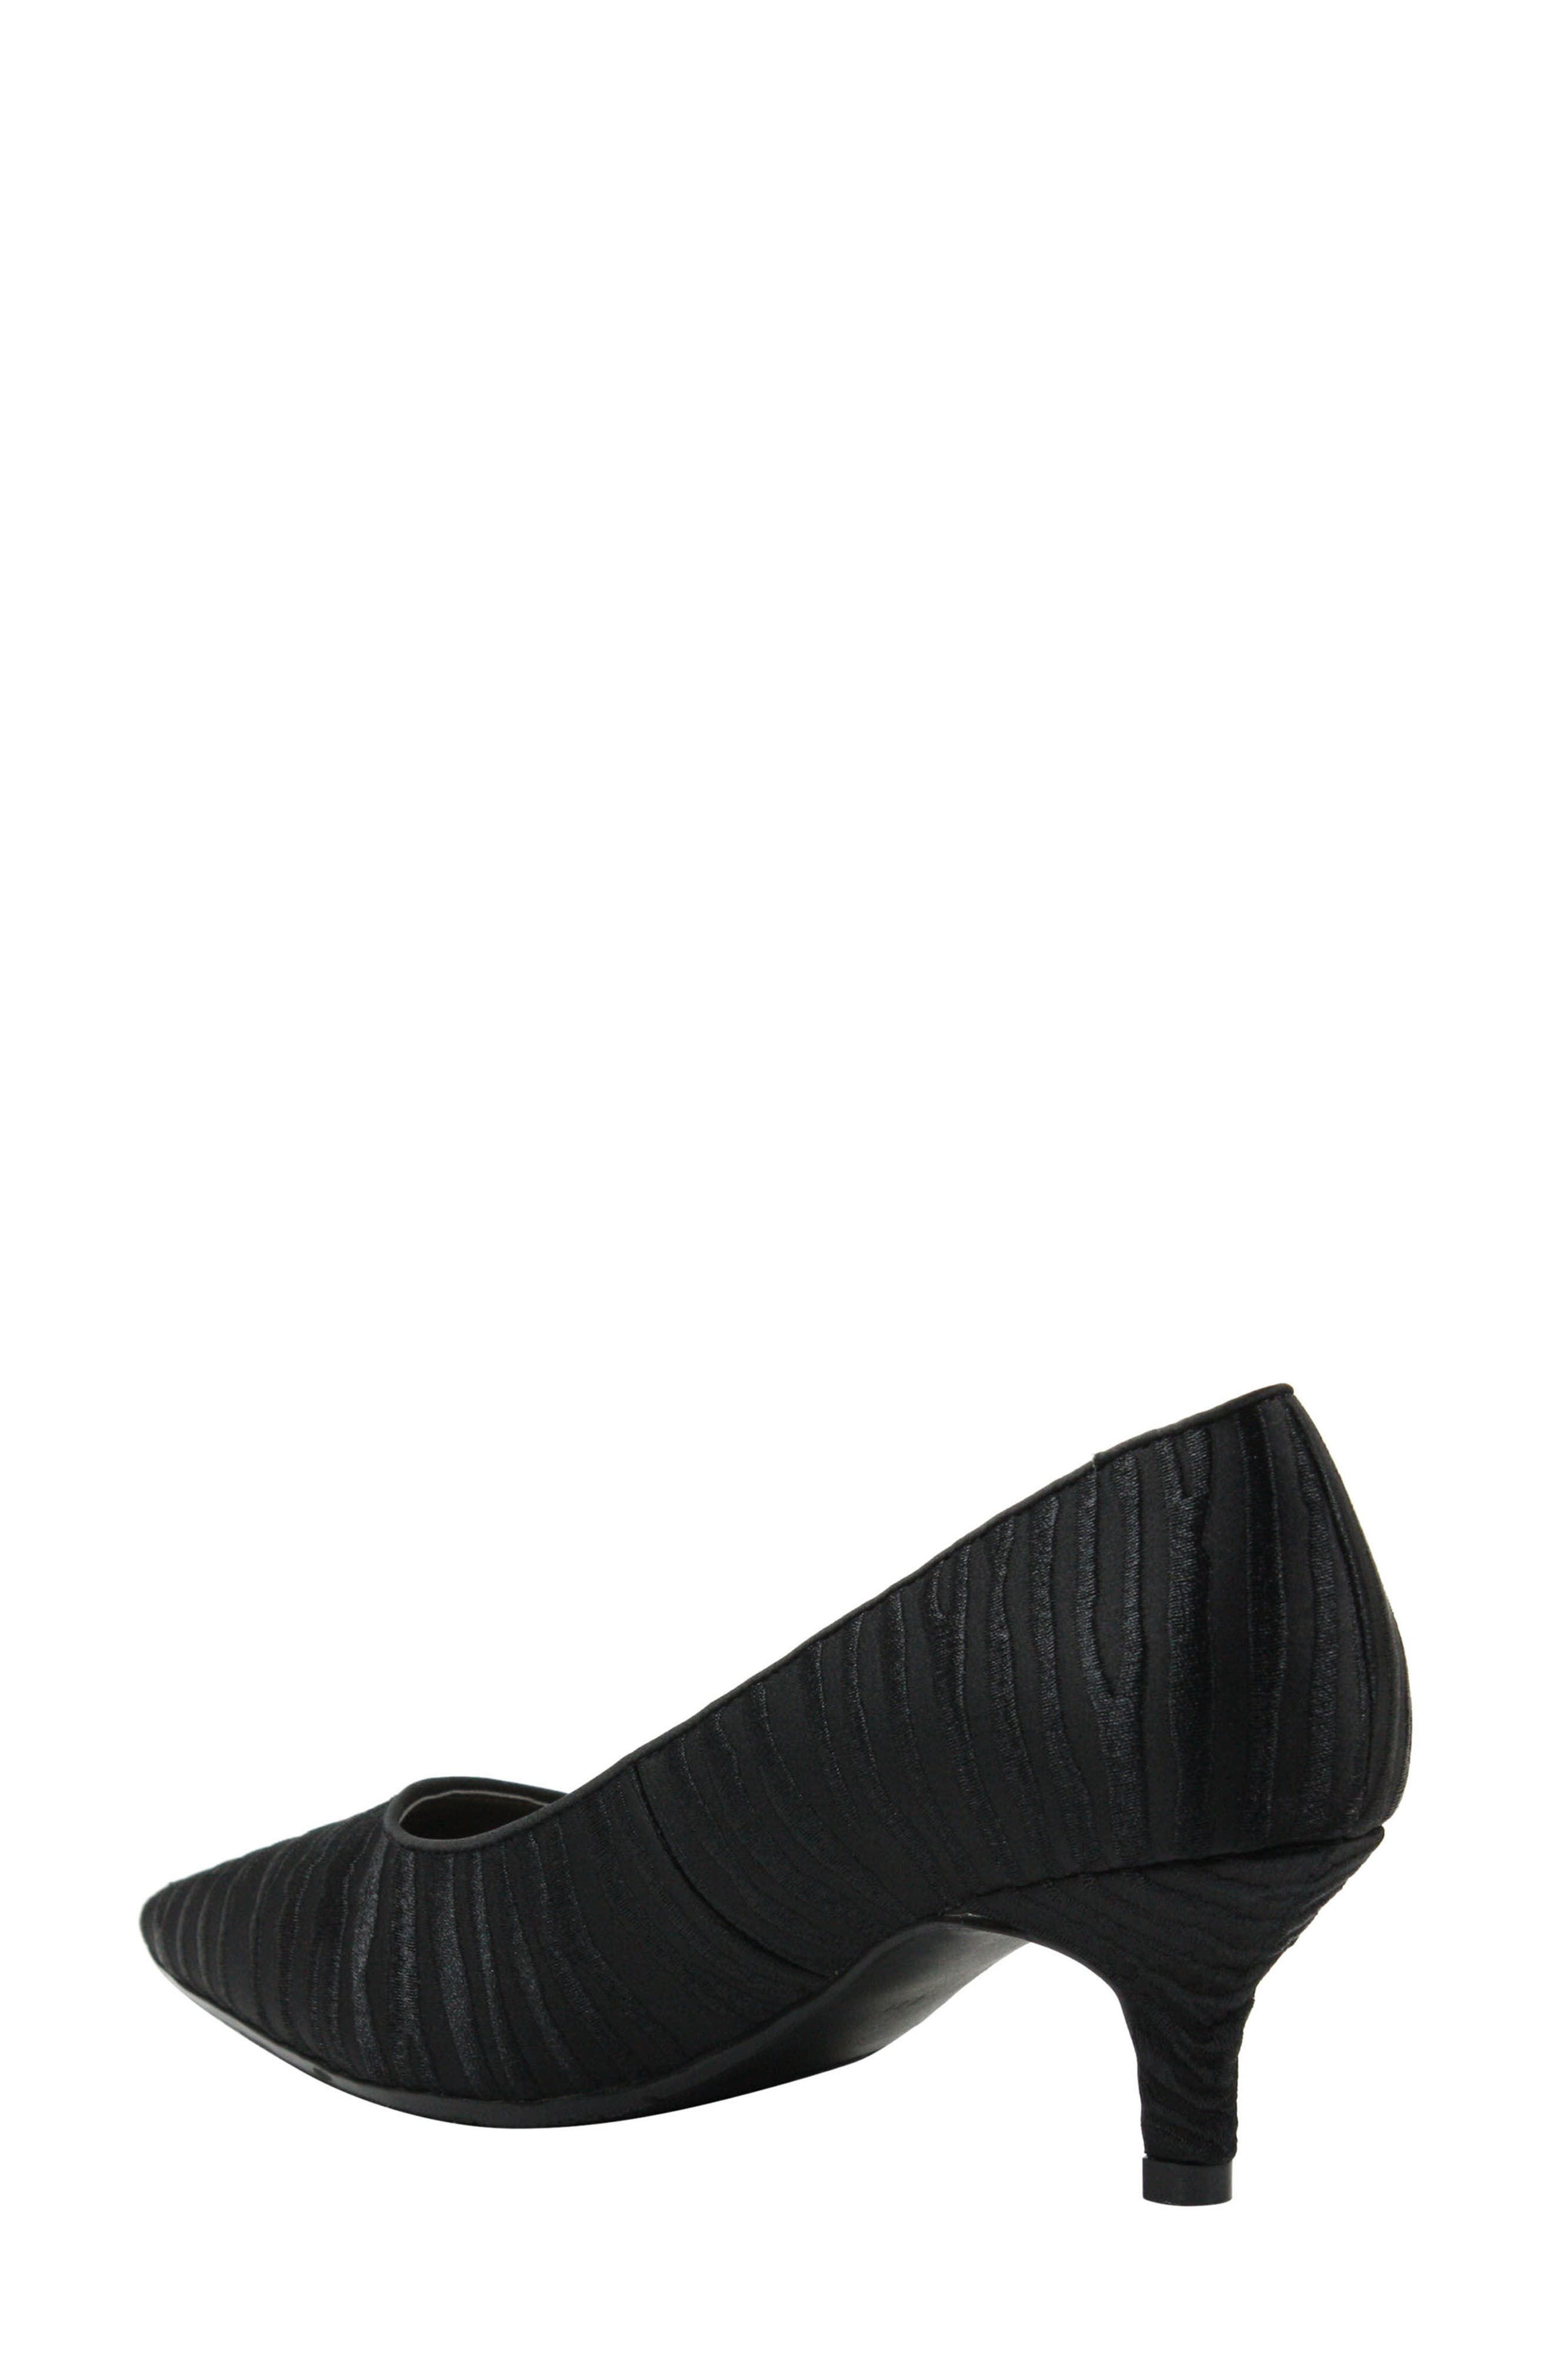 Zelaina Pump,                             Alternate thumbnail 2, color,                             Black/ Black Fabric